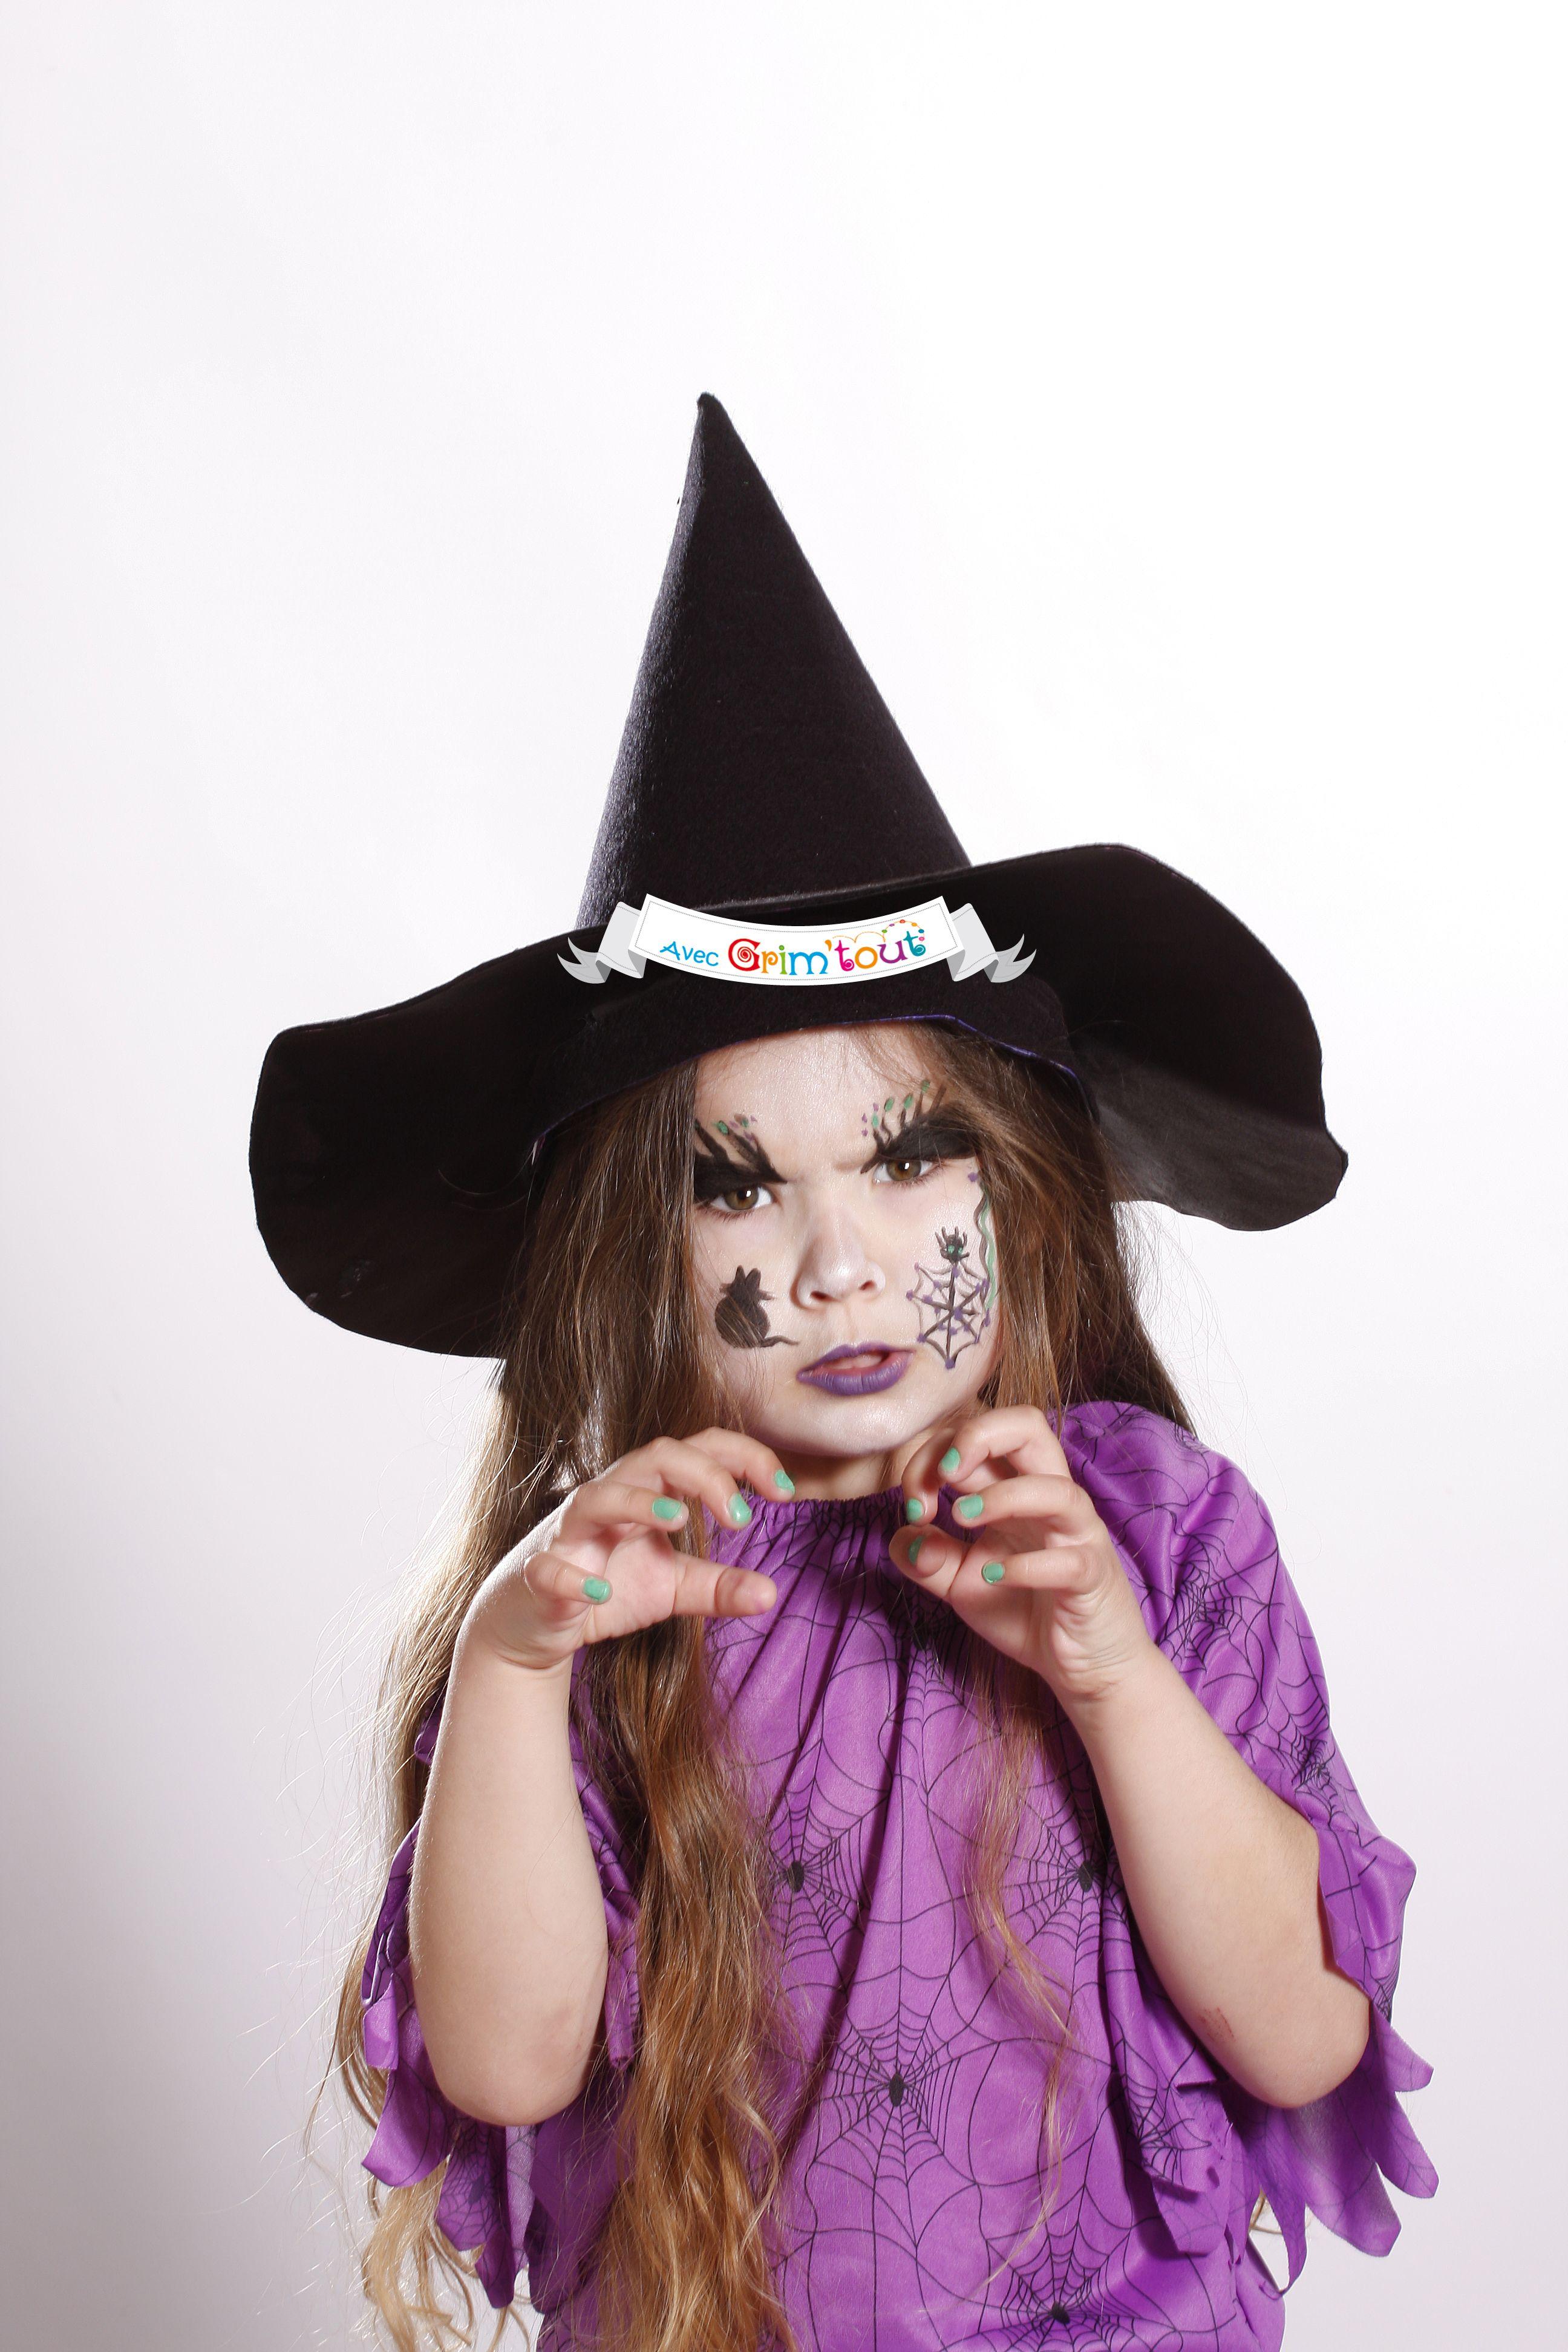 maquillage sorci re maquillage d 39 halloween pinterest. Black Bedroom Furniture Sets. Home Design Ideas